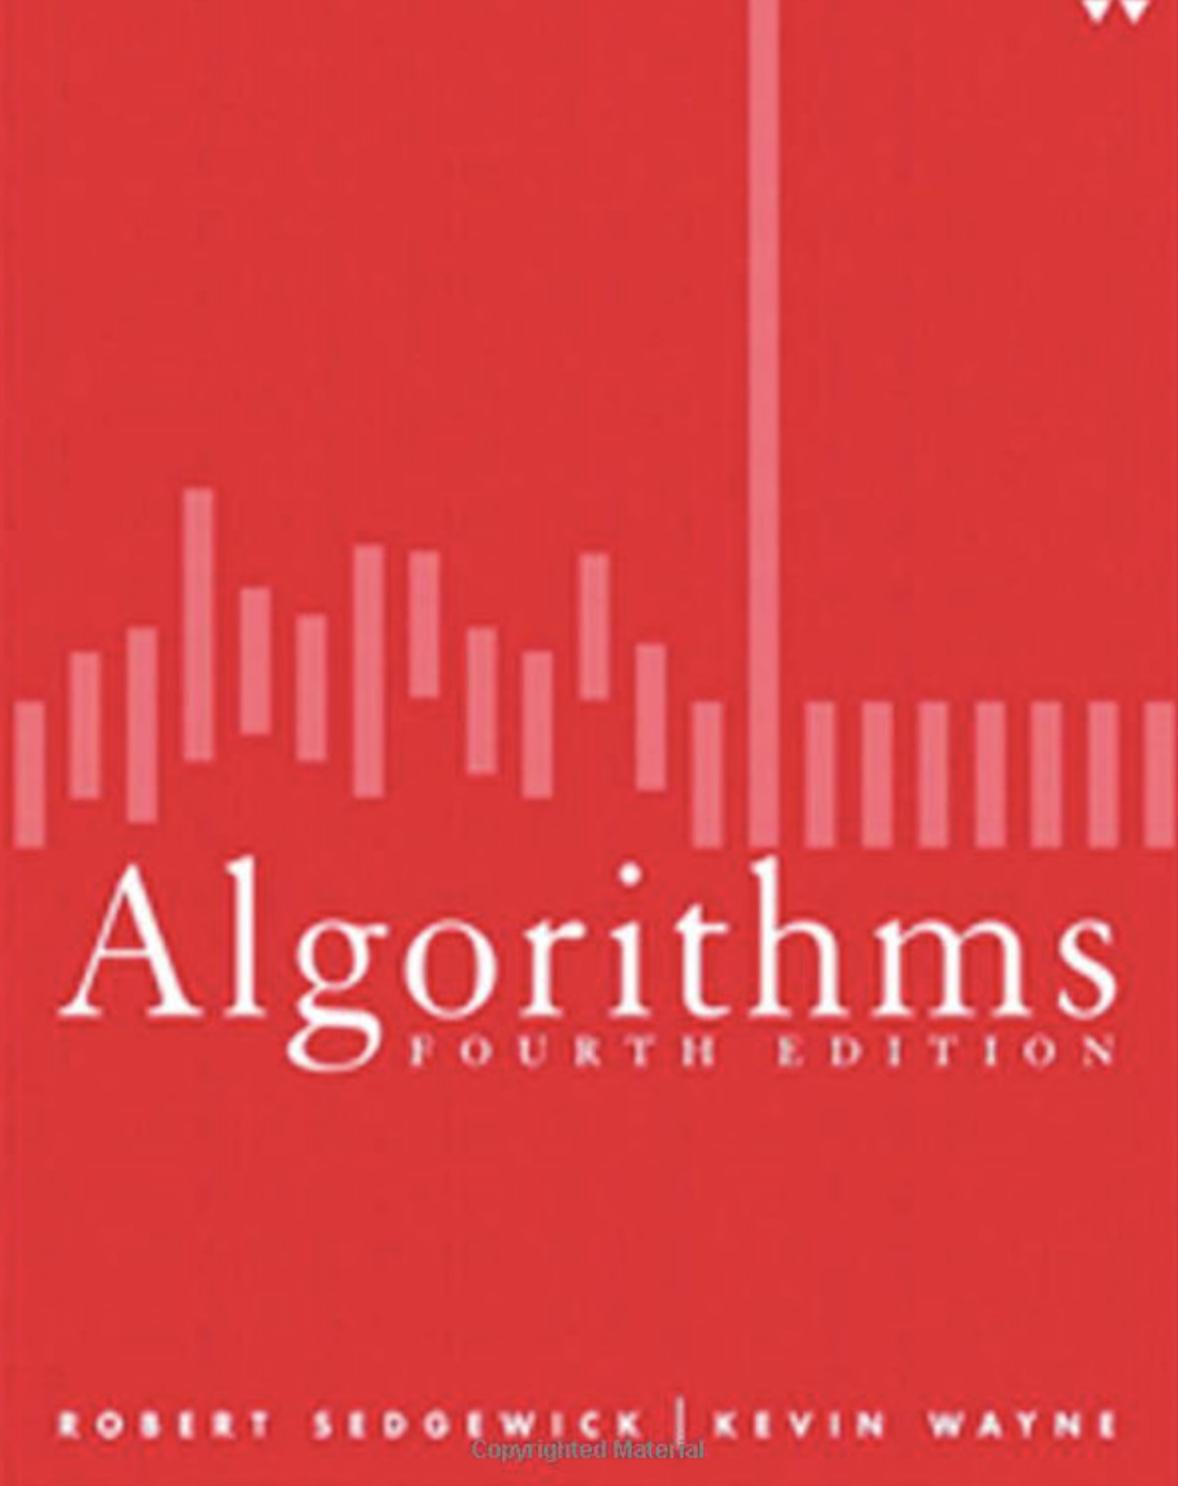 Algorithms fourth edition Book Cover